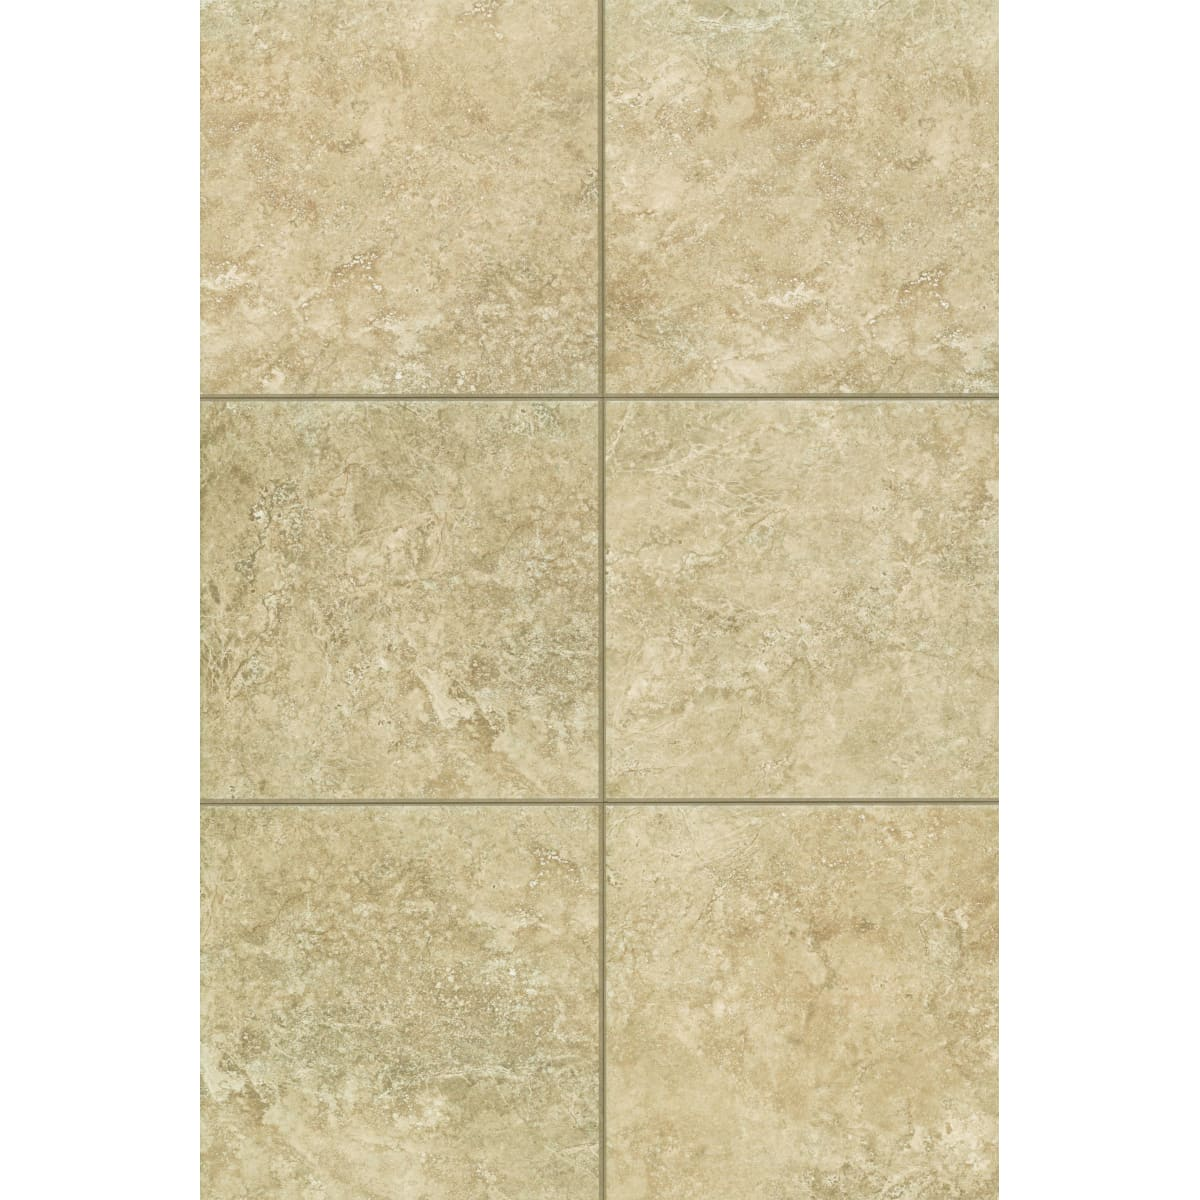 Mohawk Industries Tile Flooring 15064